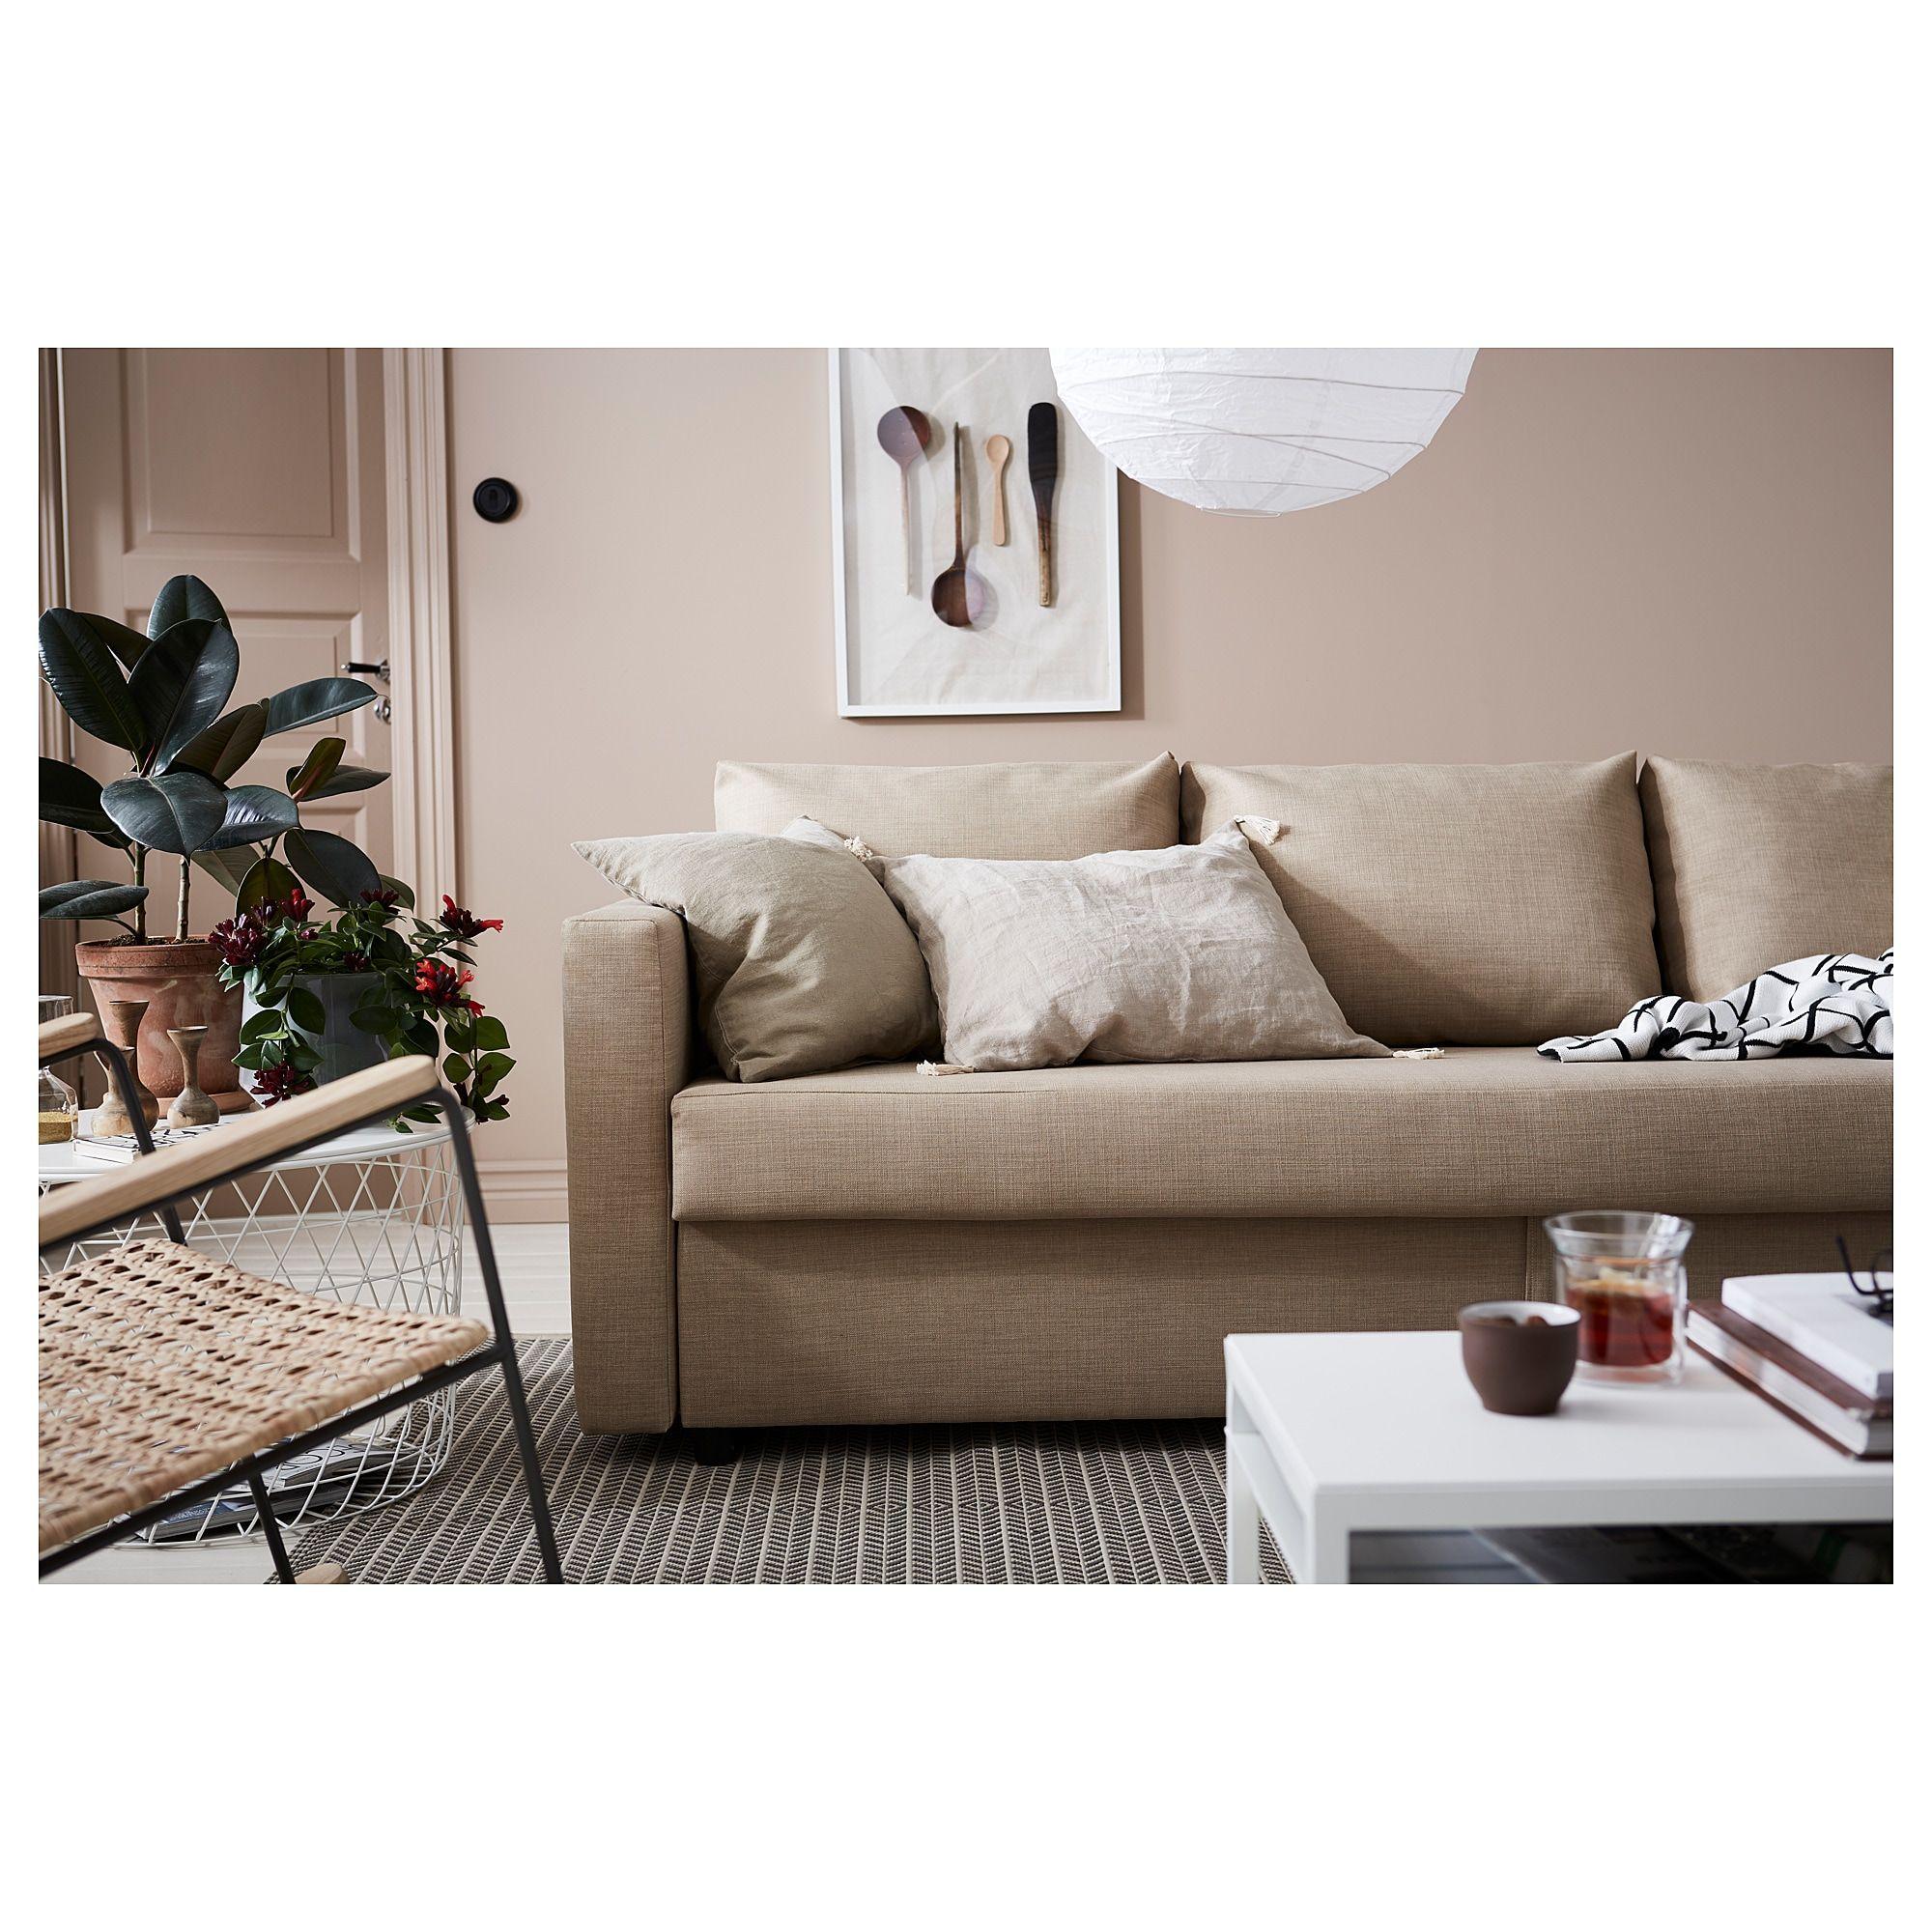 Ikea Friheten Sofa Bed Skiftebo Beige Dreaming Of Cottage In